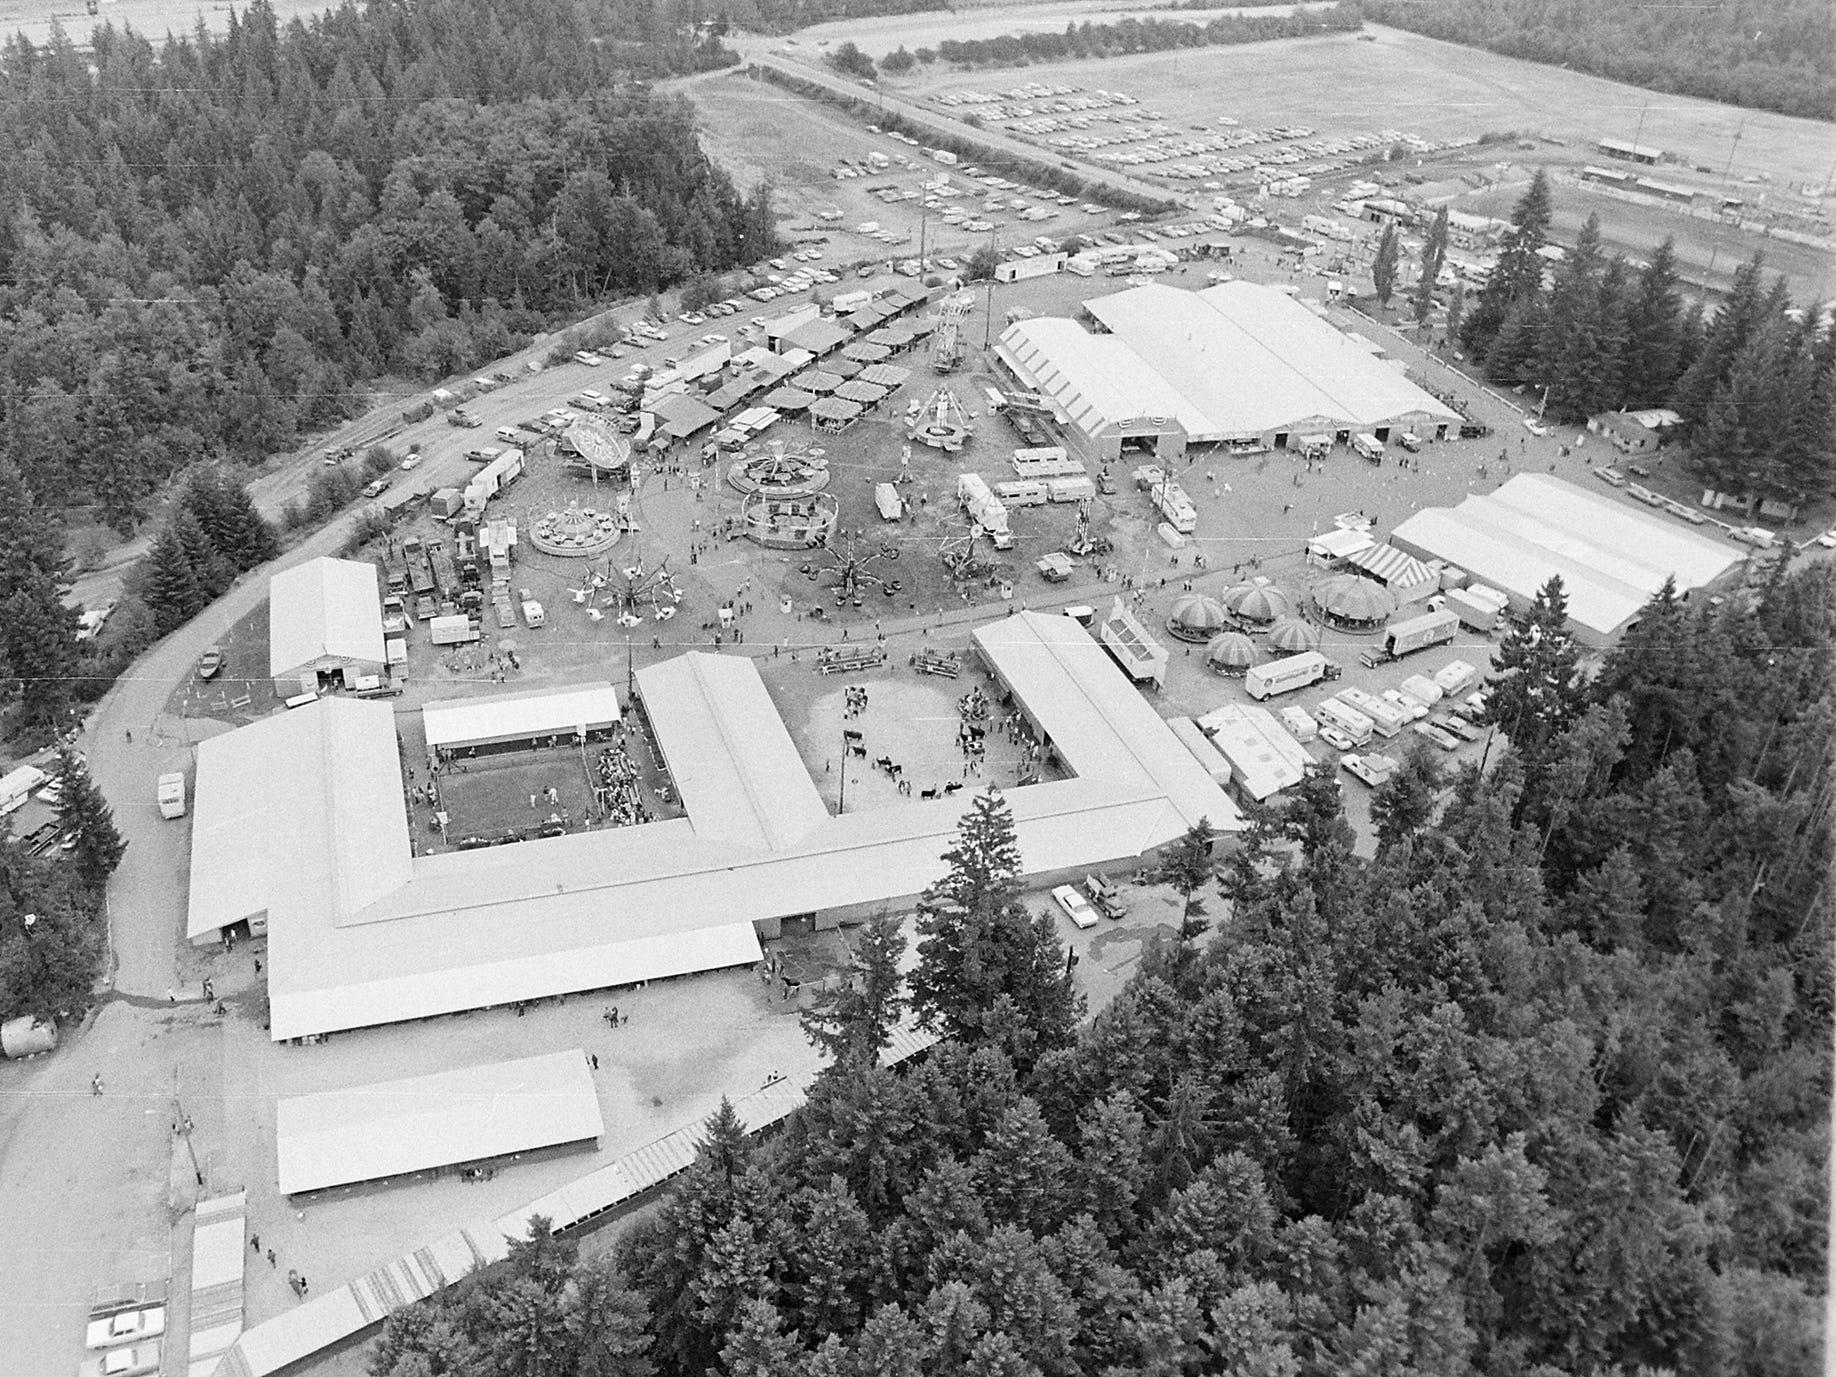 08/24/73Fairgrounds Aerial